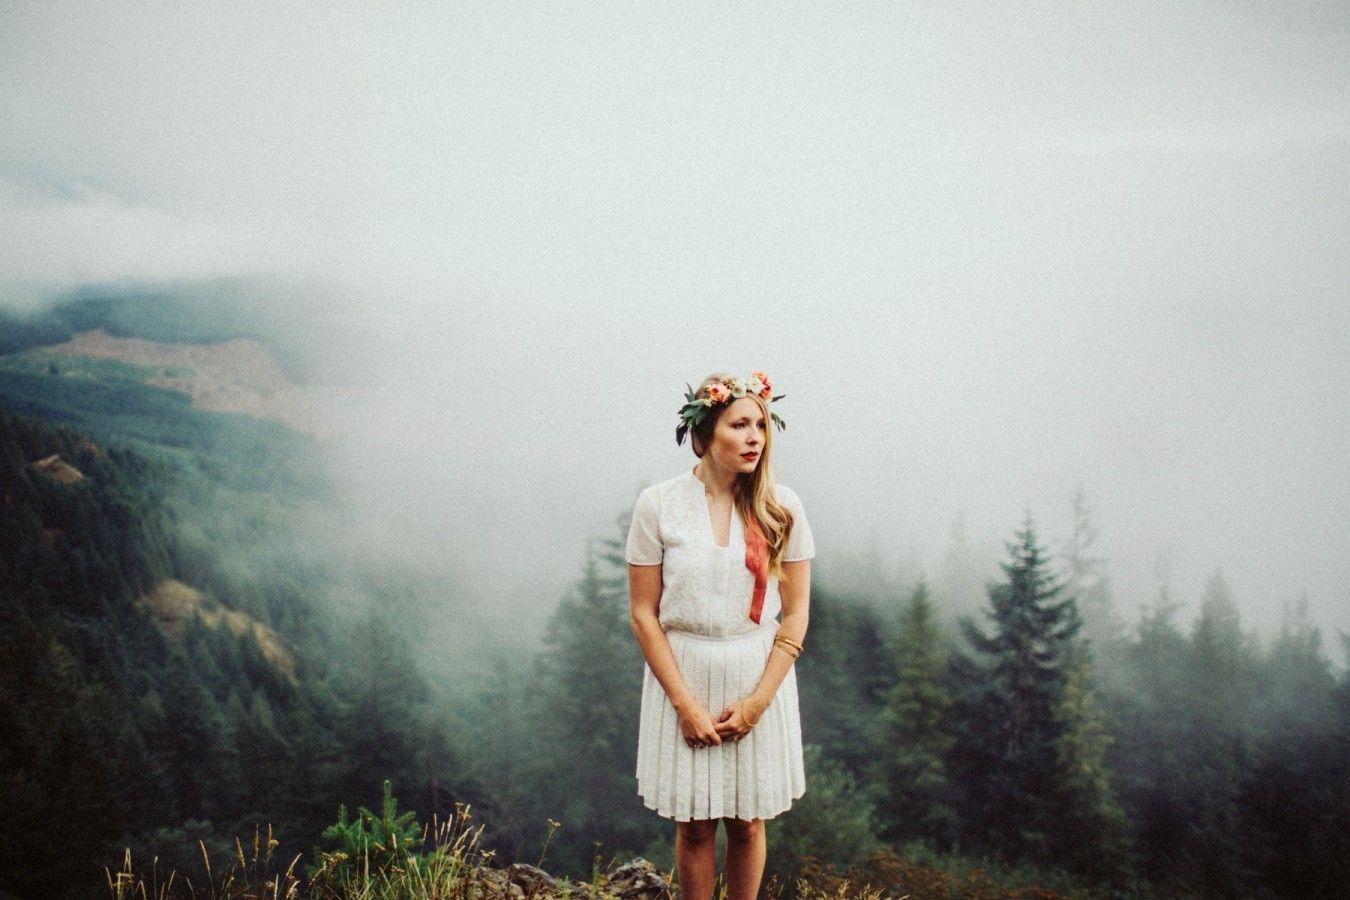 Mountain Peak Engagement - Dylan and Sara Photography